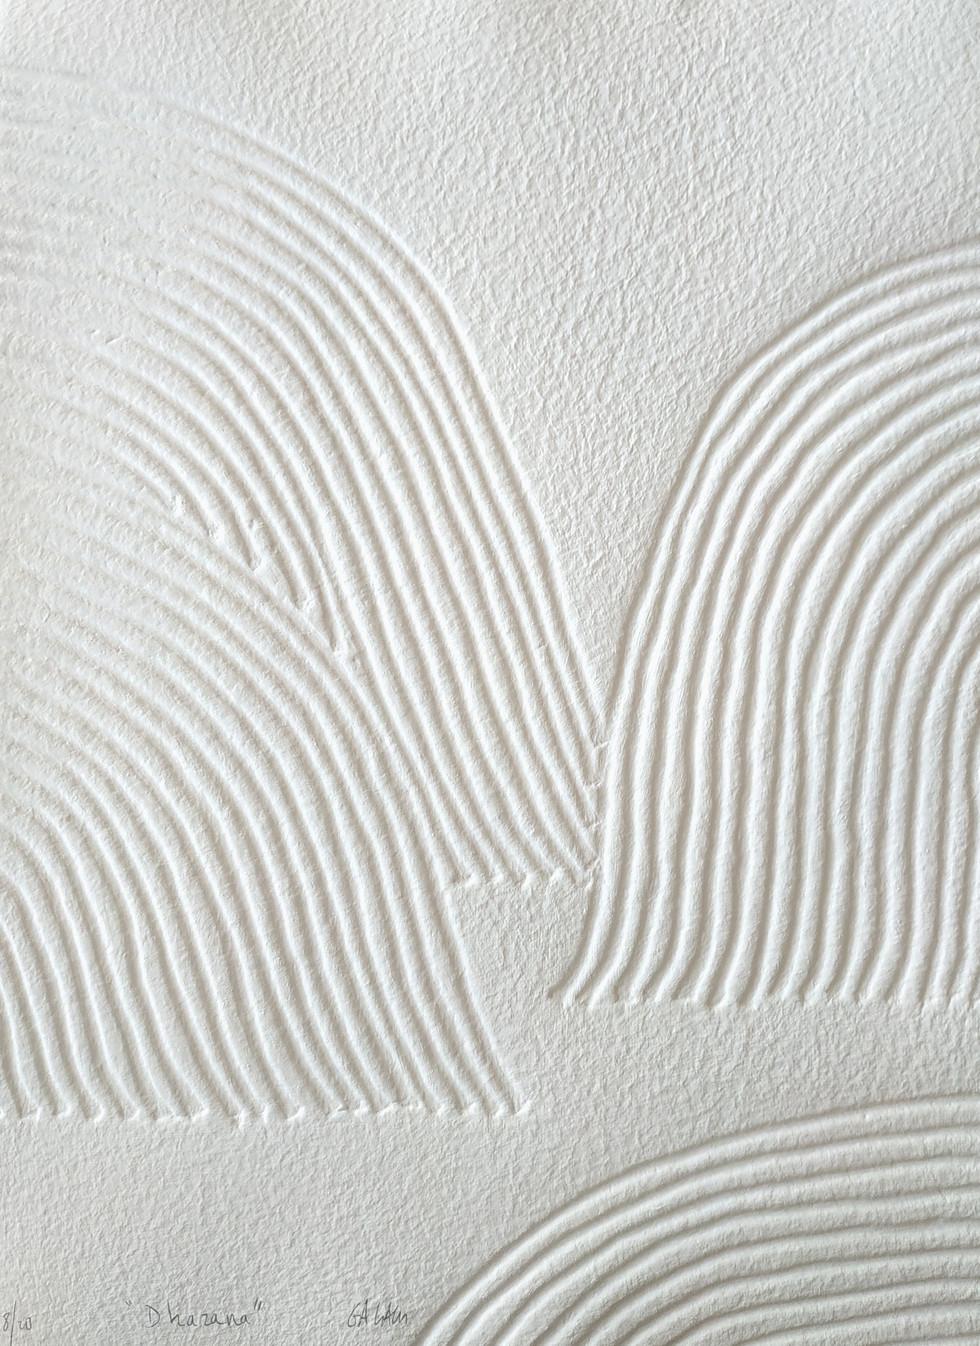 Dharana Papierreliefabdruck, 20 Ex., 77 x 56 cm, verso sign. & num. - verkauft -